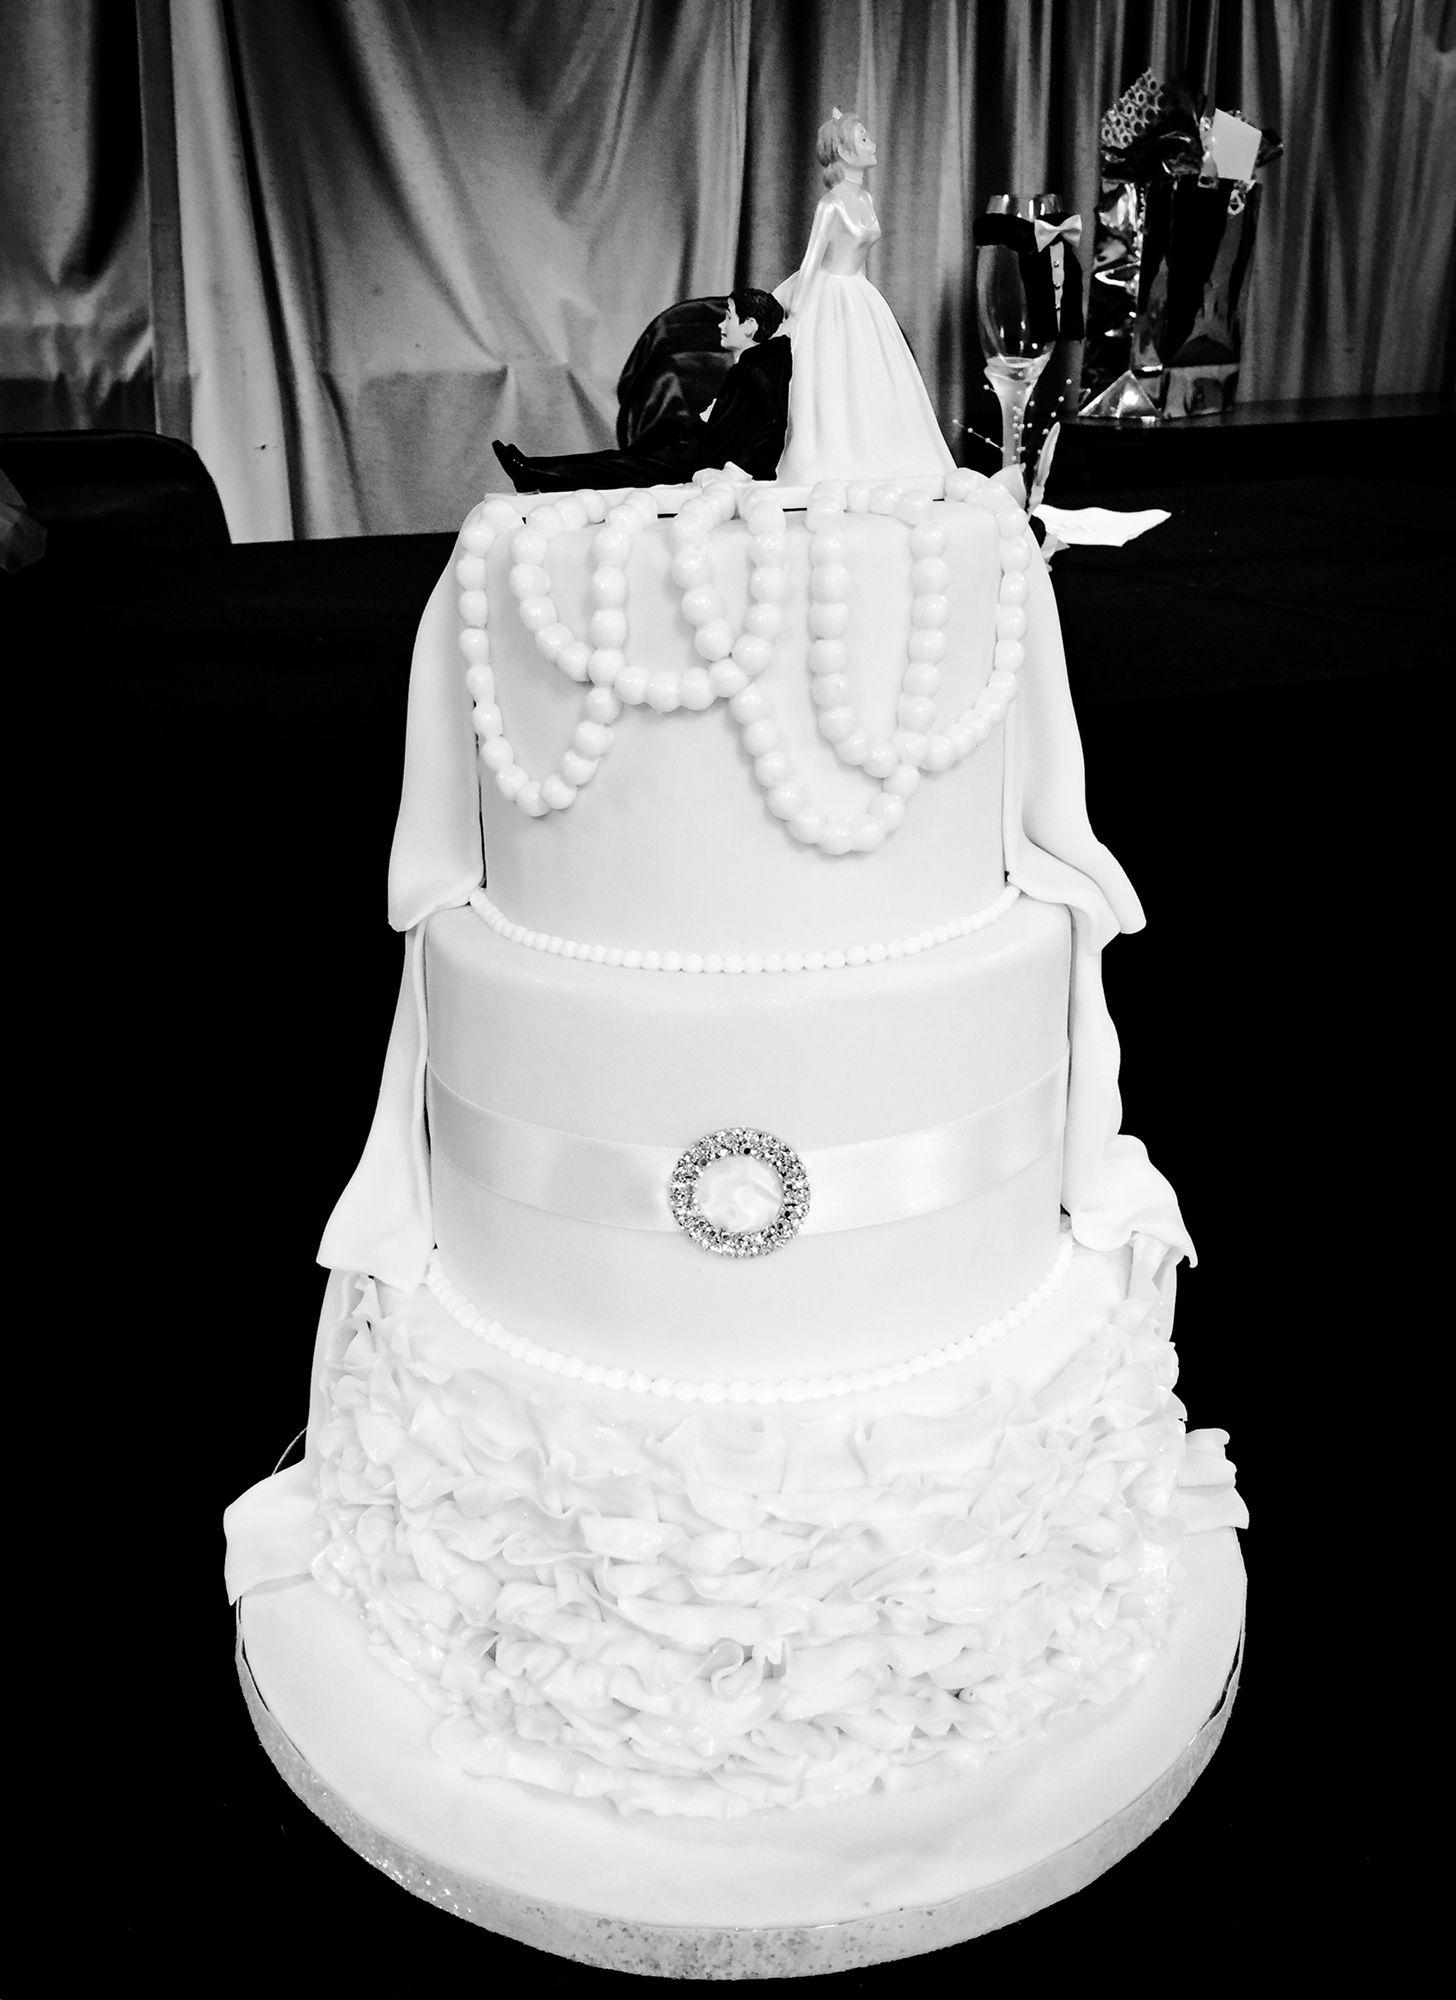 White fondant wedding cake..ruffles & pearls..by Elisa Garcia ...